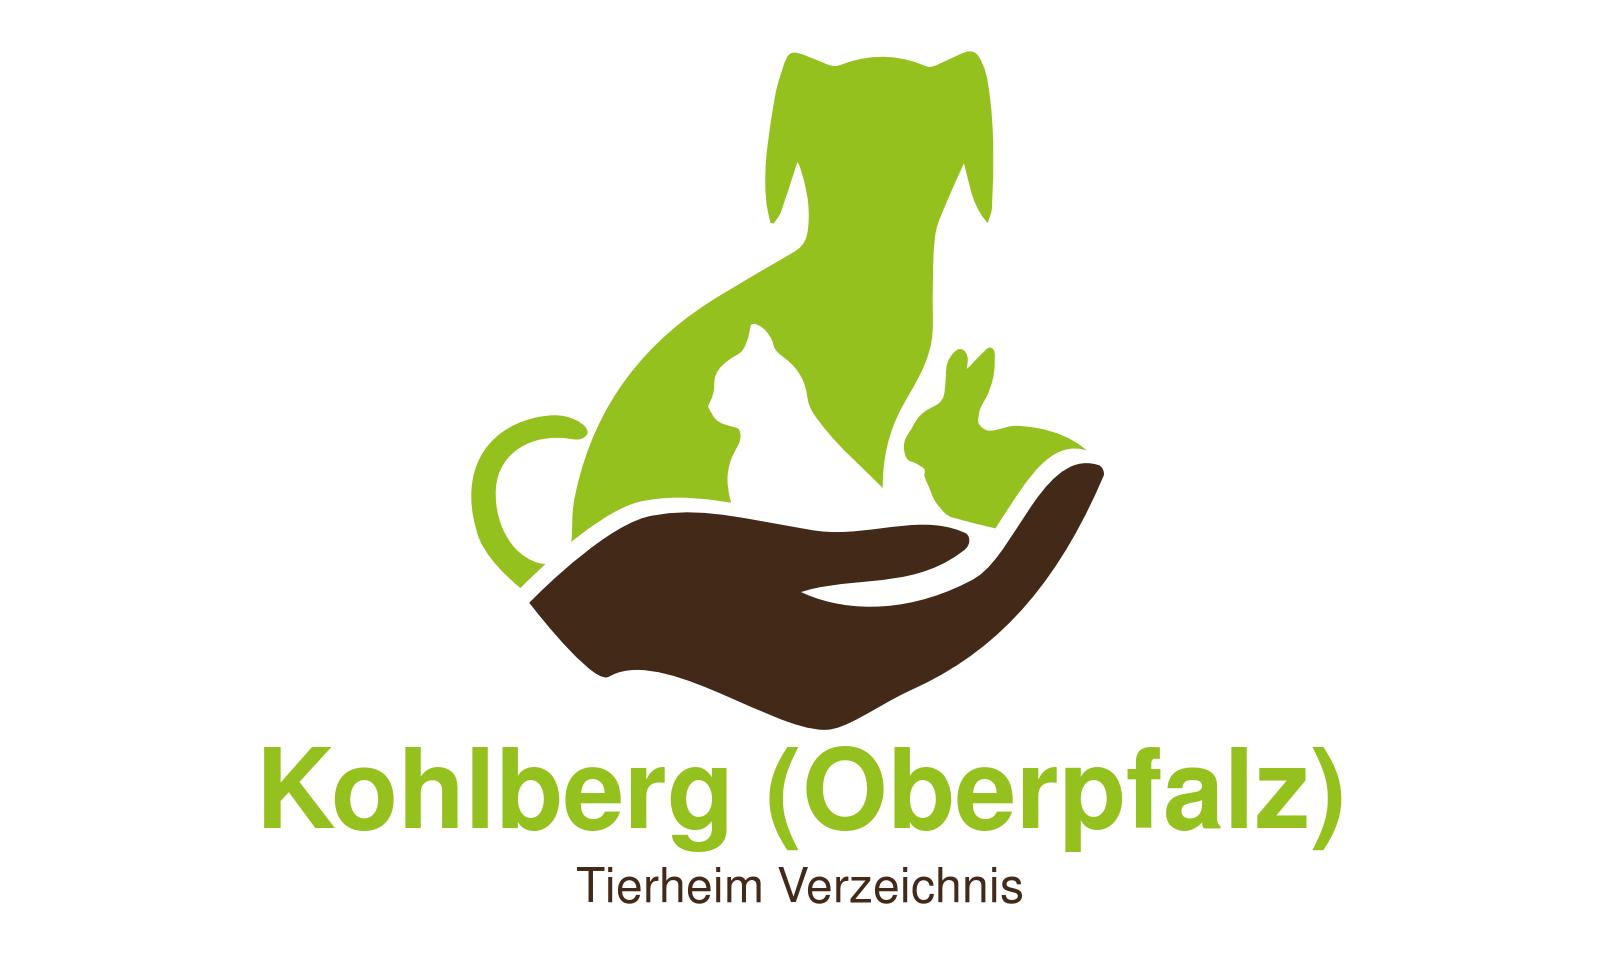 Tierheim Kohlberg (Oberpfalz)